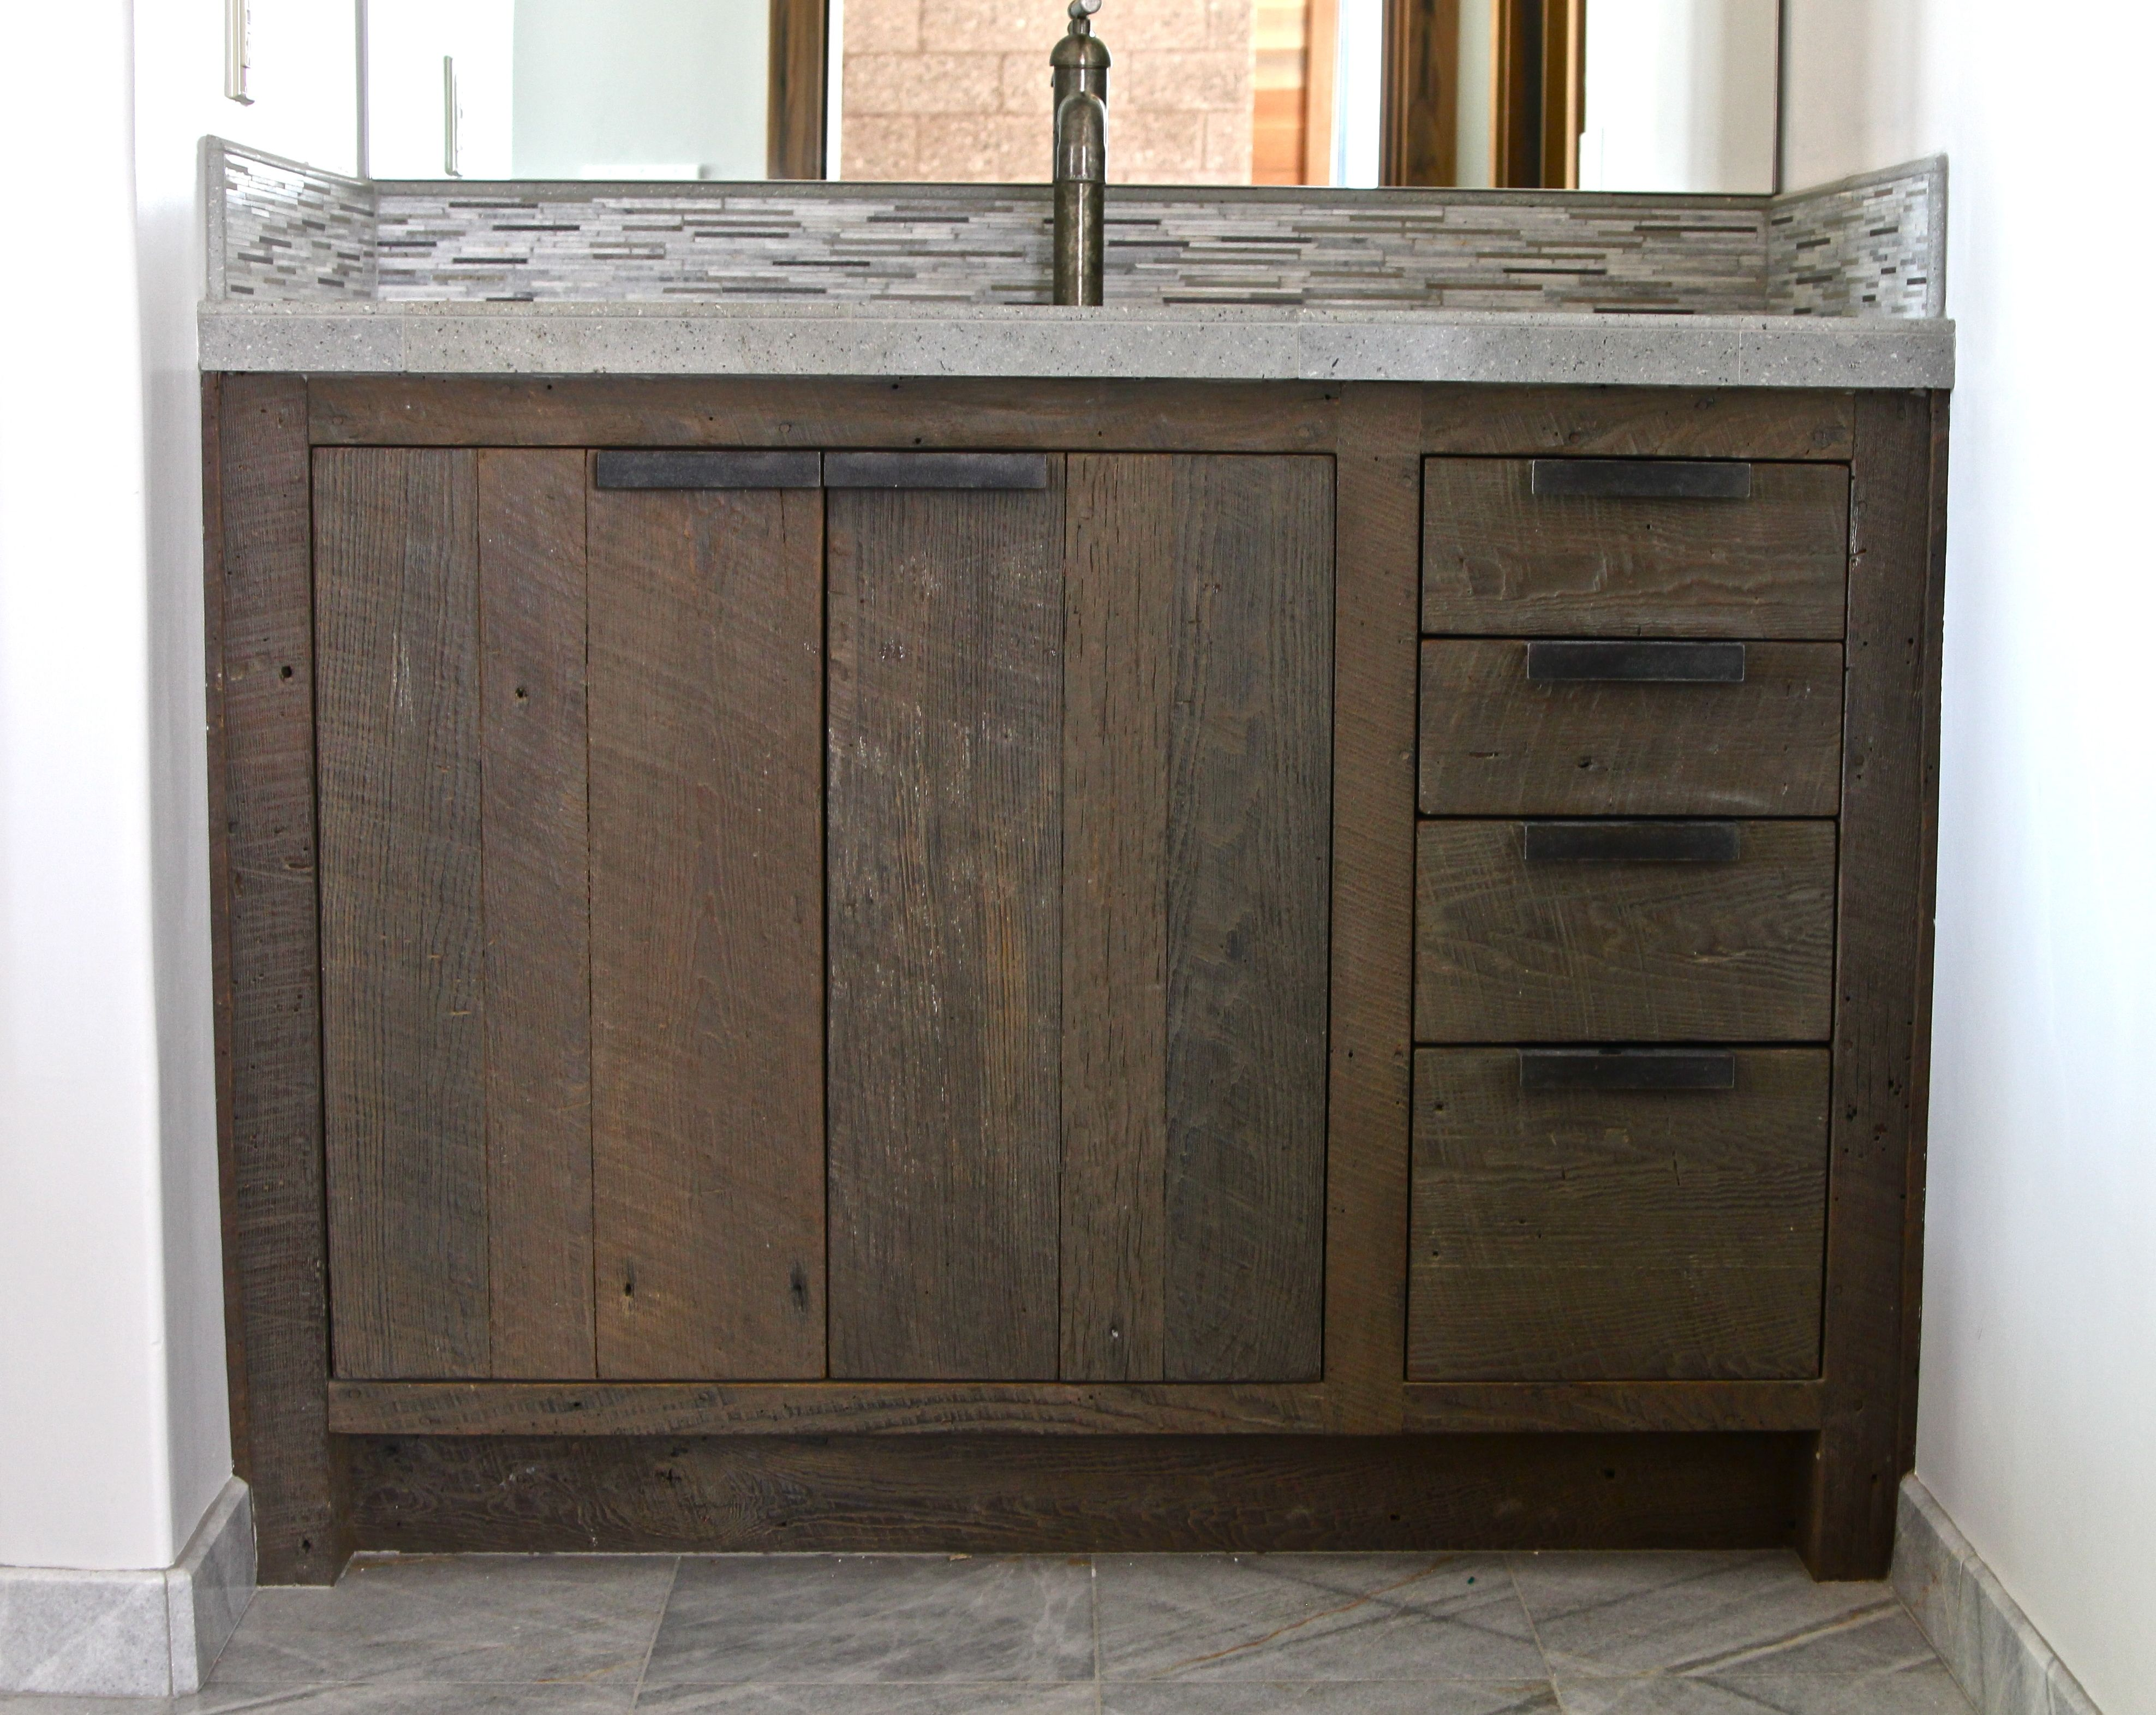 Unfinished bathroom vanity base - Bathroom Classic Unfinished Barn Wood Ikea Bathroom Vanity With Double Door With New Ideas And